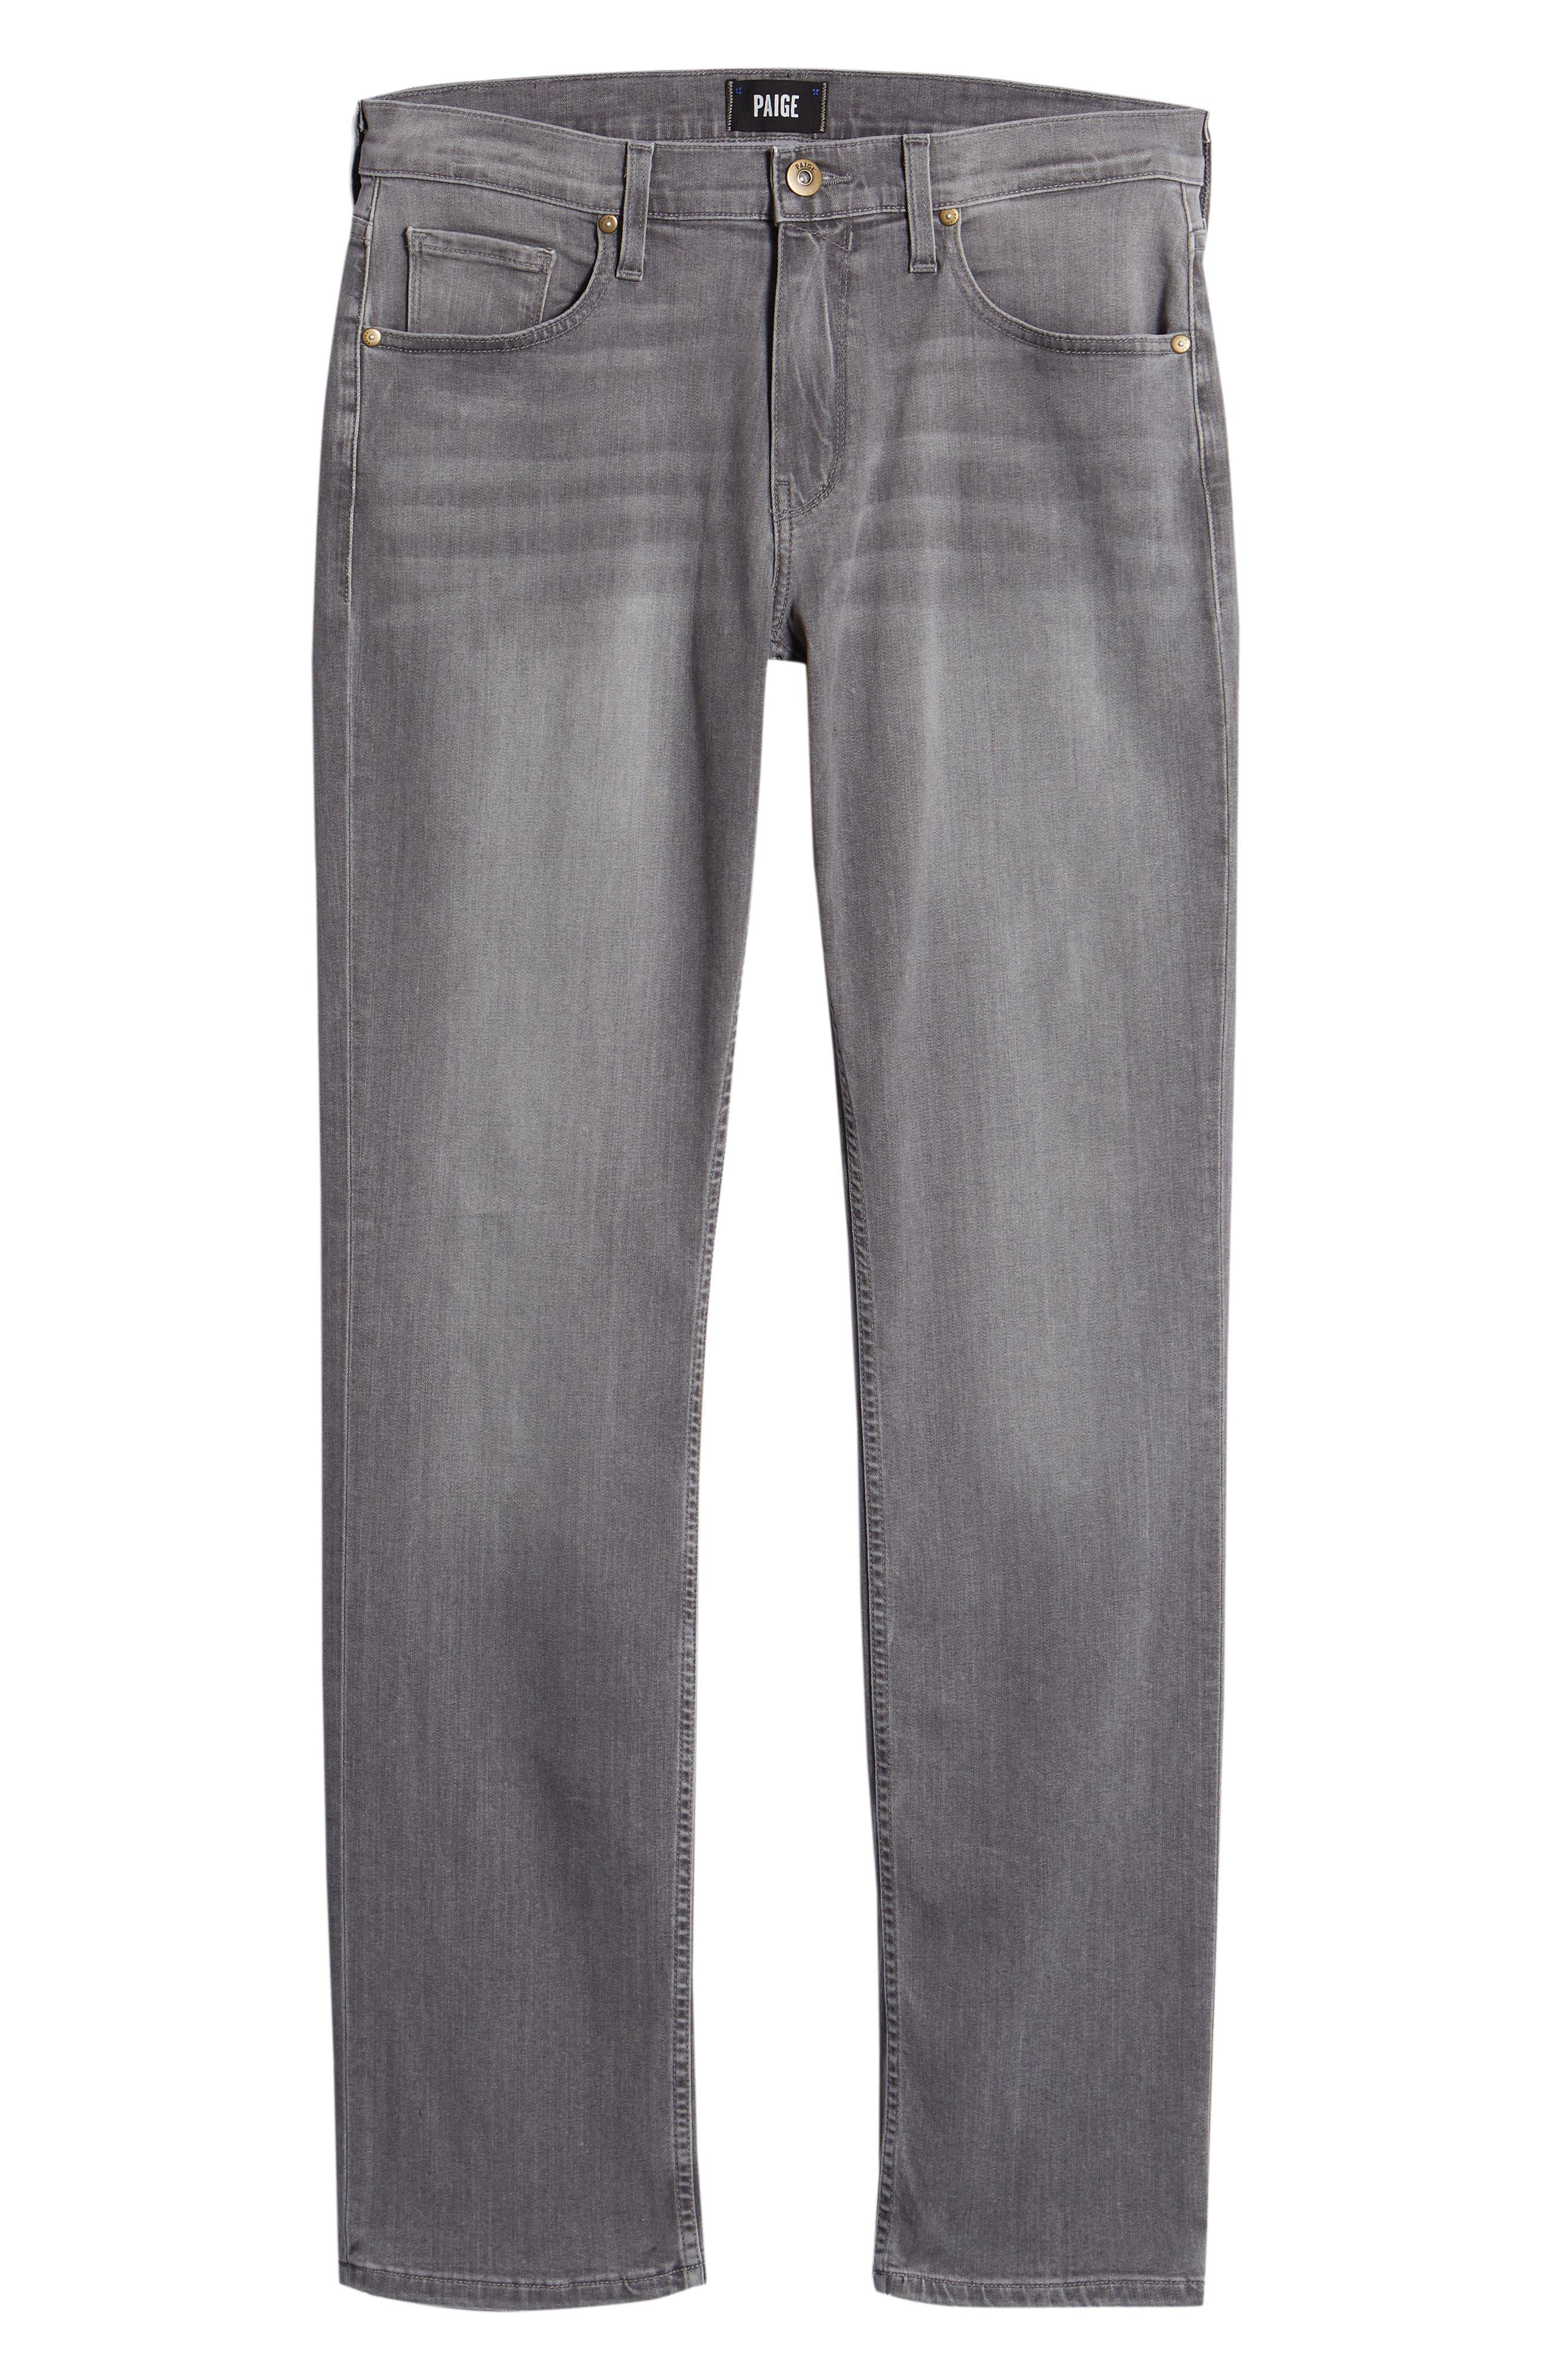 Normandie Straight Leg Jeans,                             Alternate thumbnail 6, color,                             030